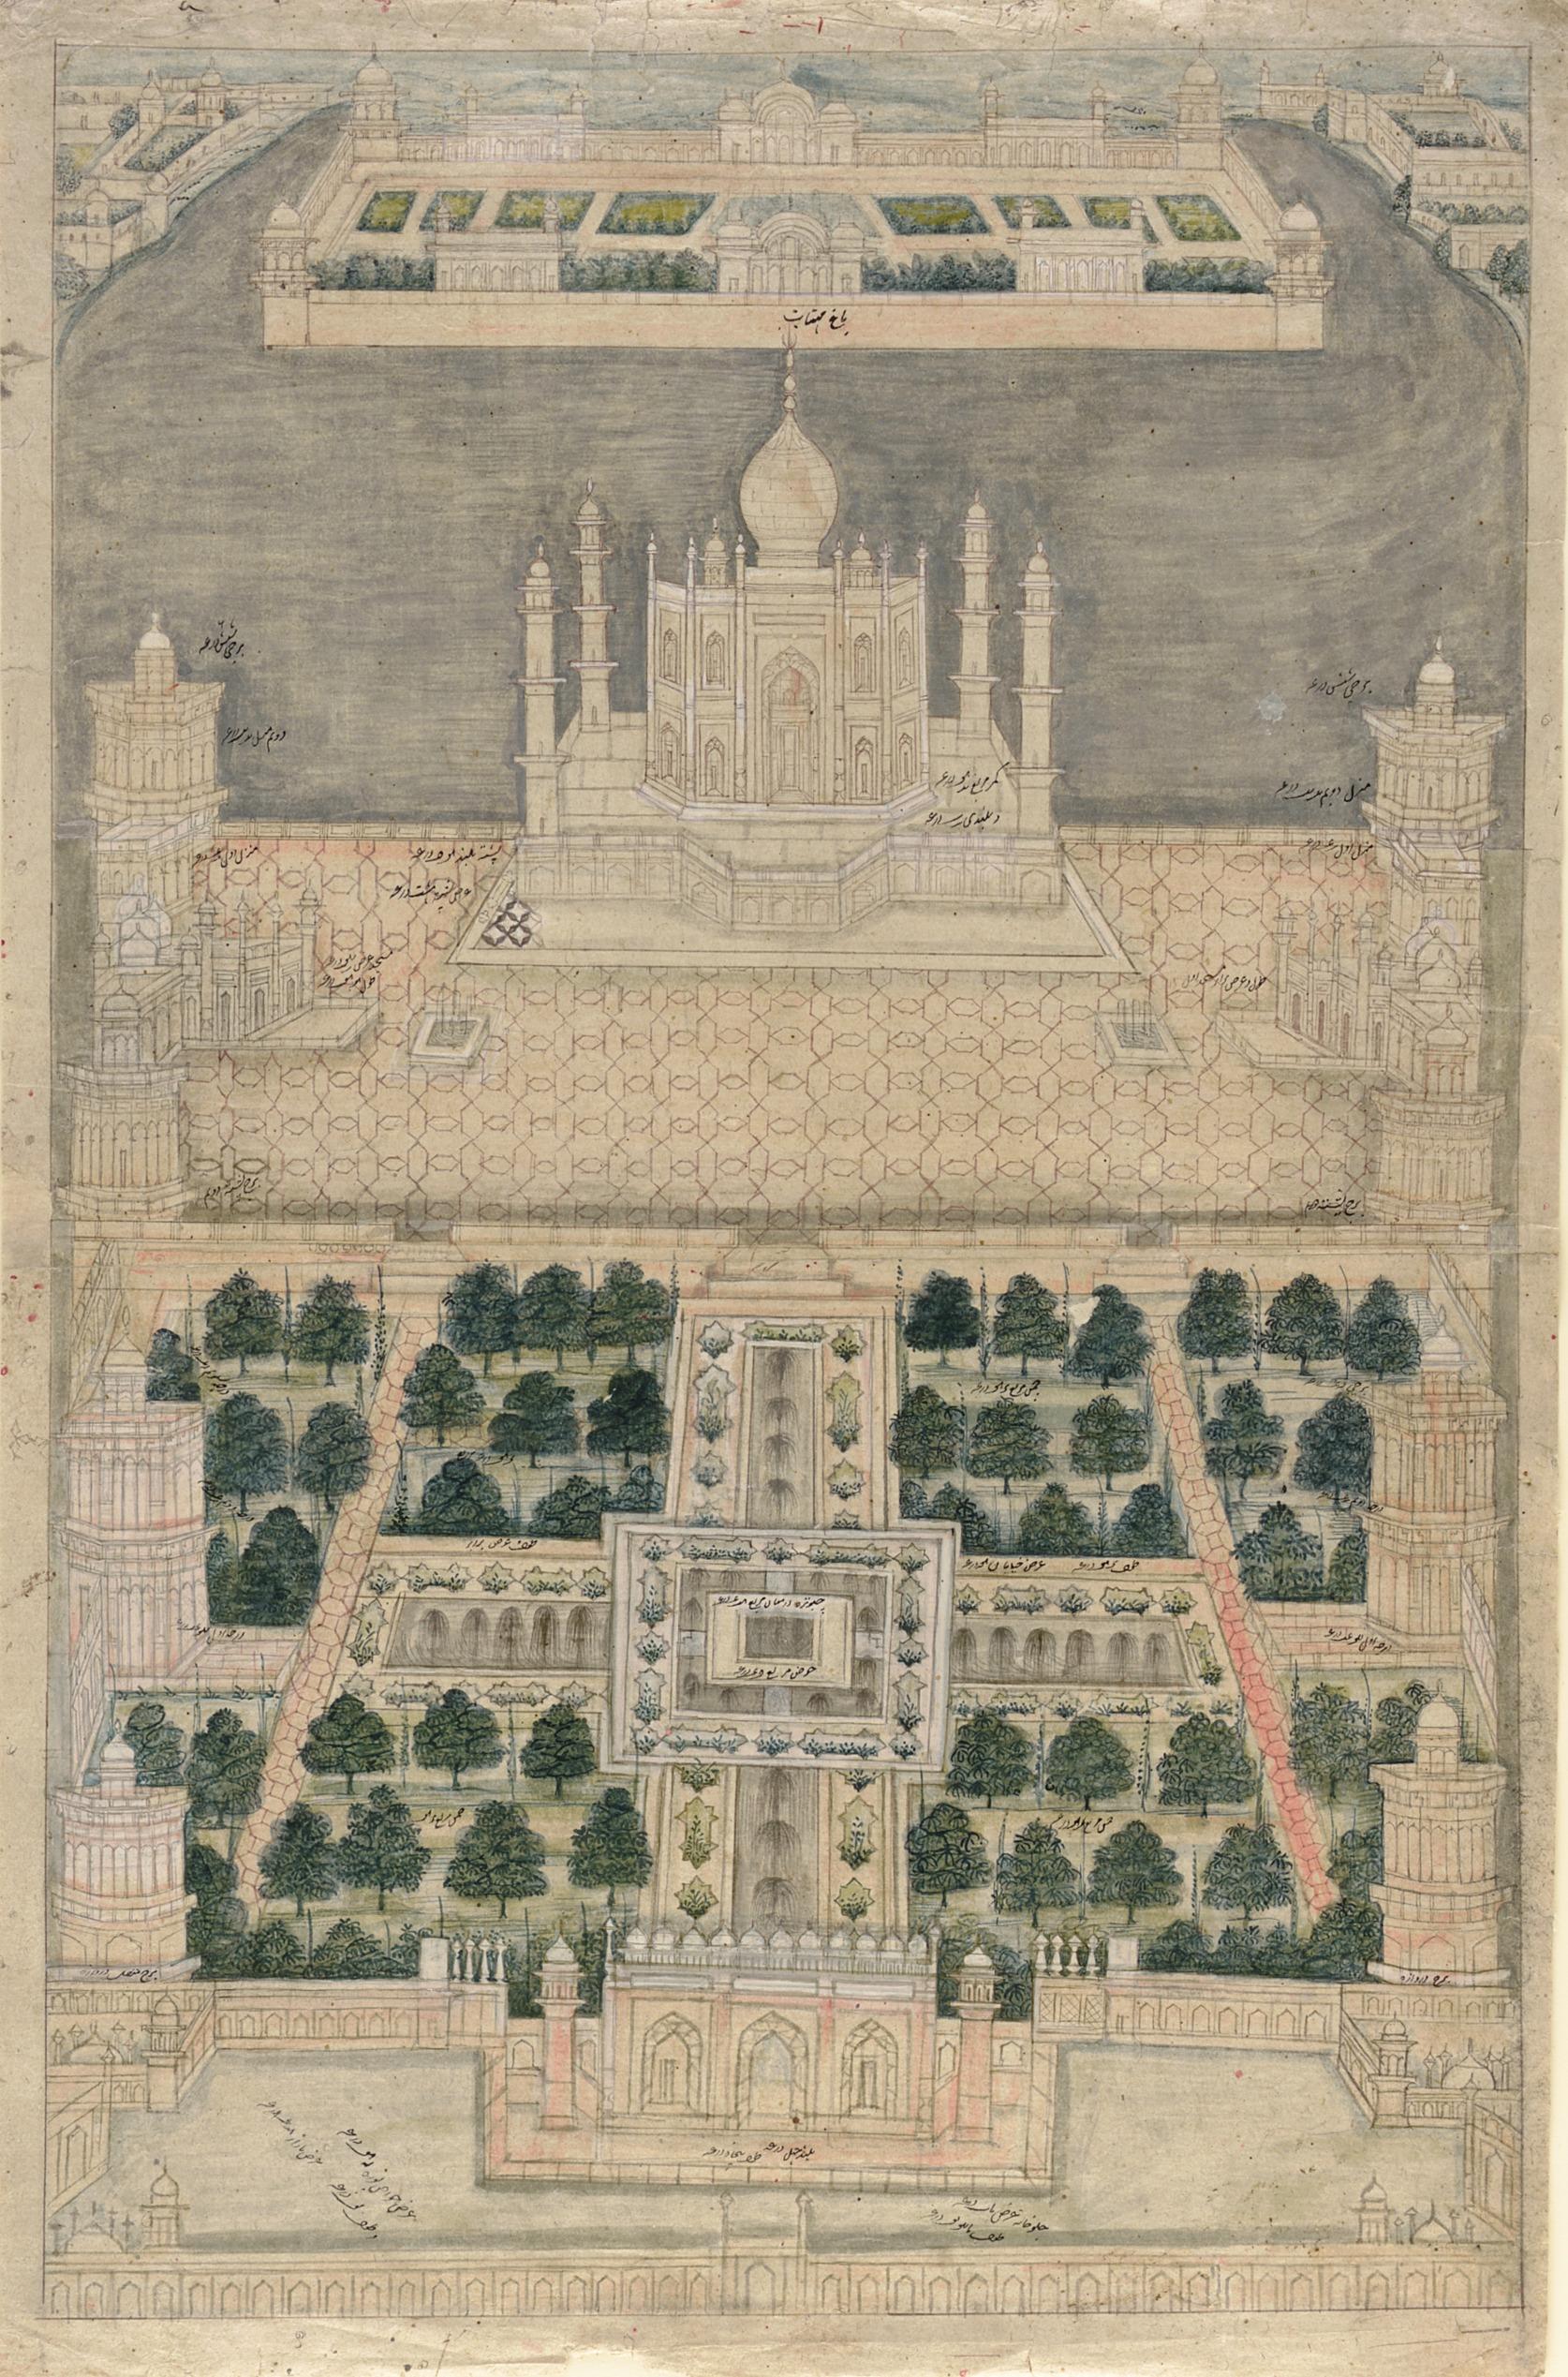 Bird's Eye View of the Taj Mahal at Agra